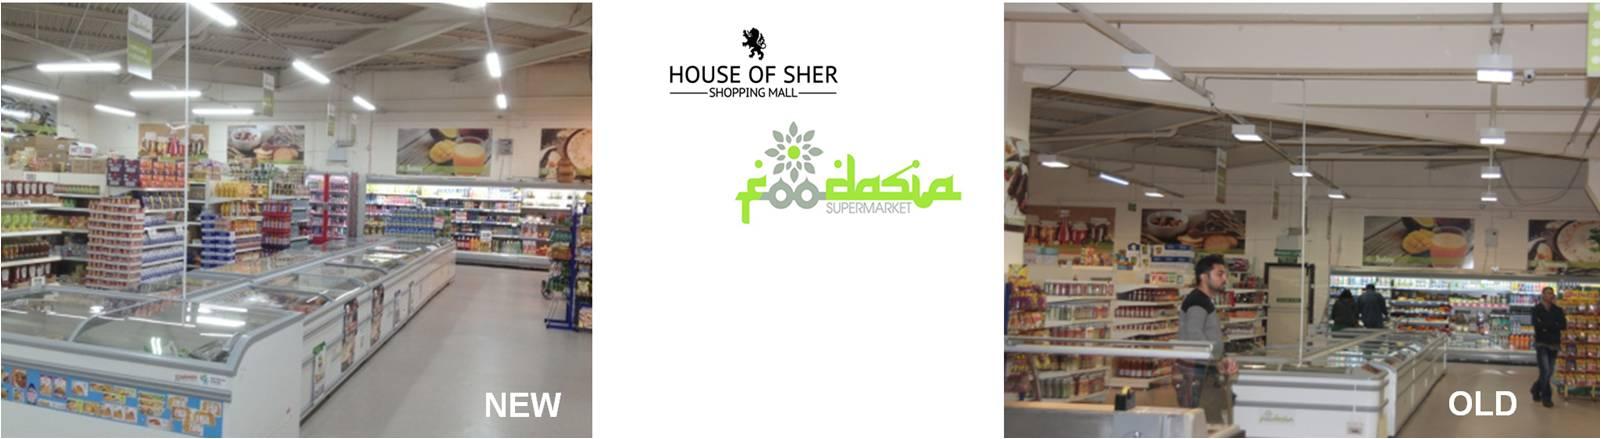 LED Distribution | Projects | Mall (Sher/Foodasia) | Glasgow, Scotland